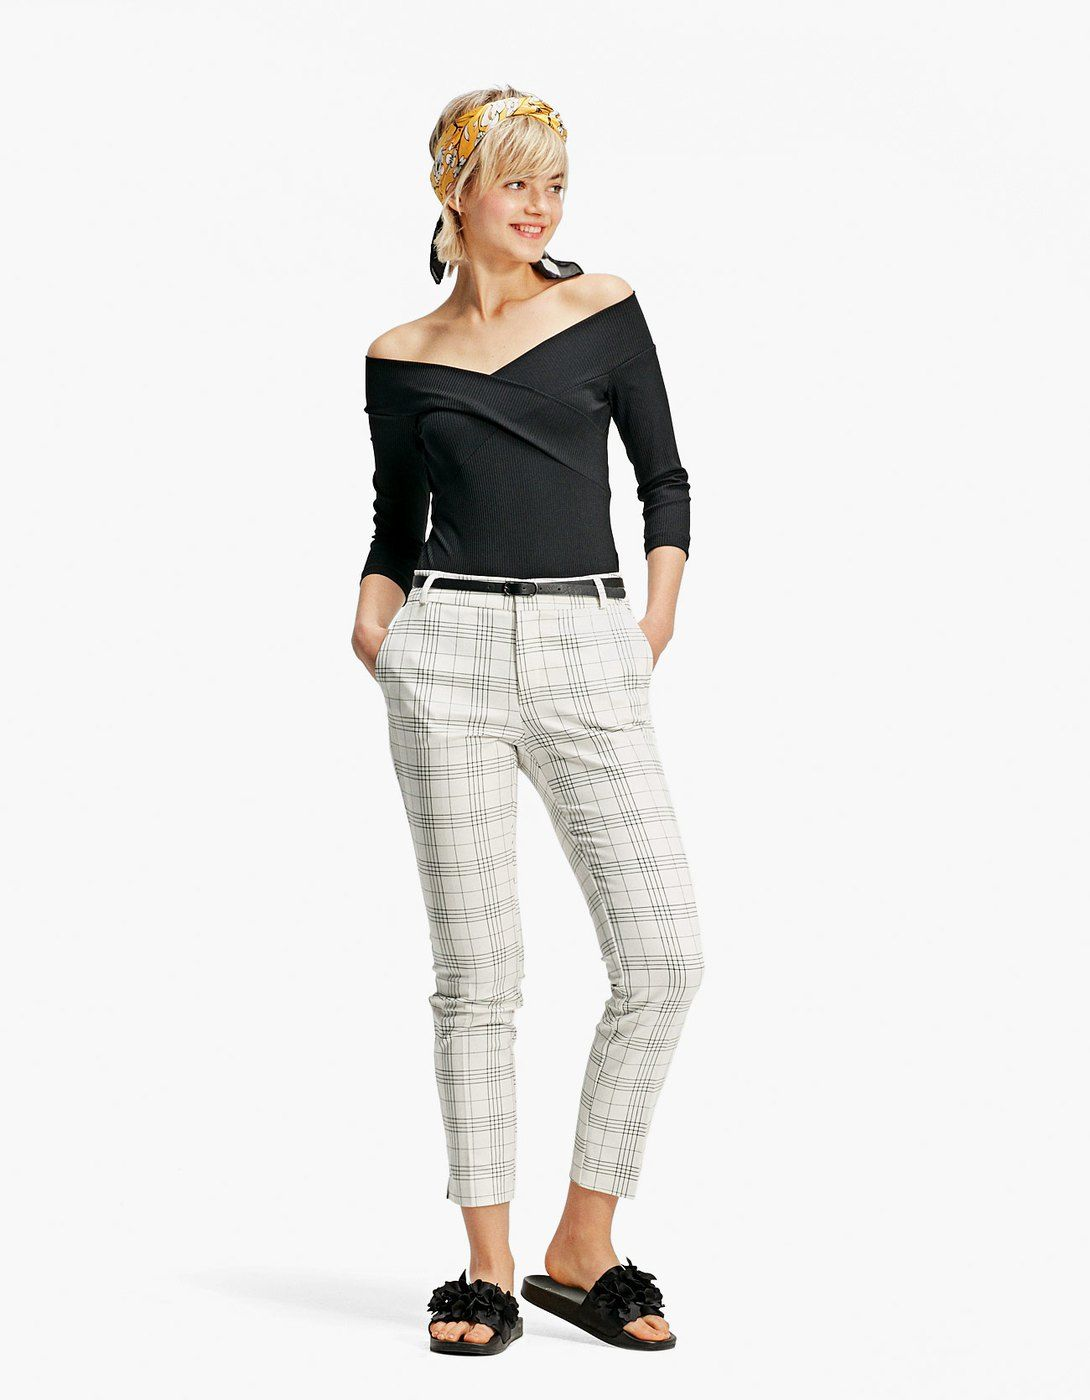 Pantalón de vestir checks con cinturón - Pantalones  ea413889b139